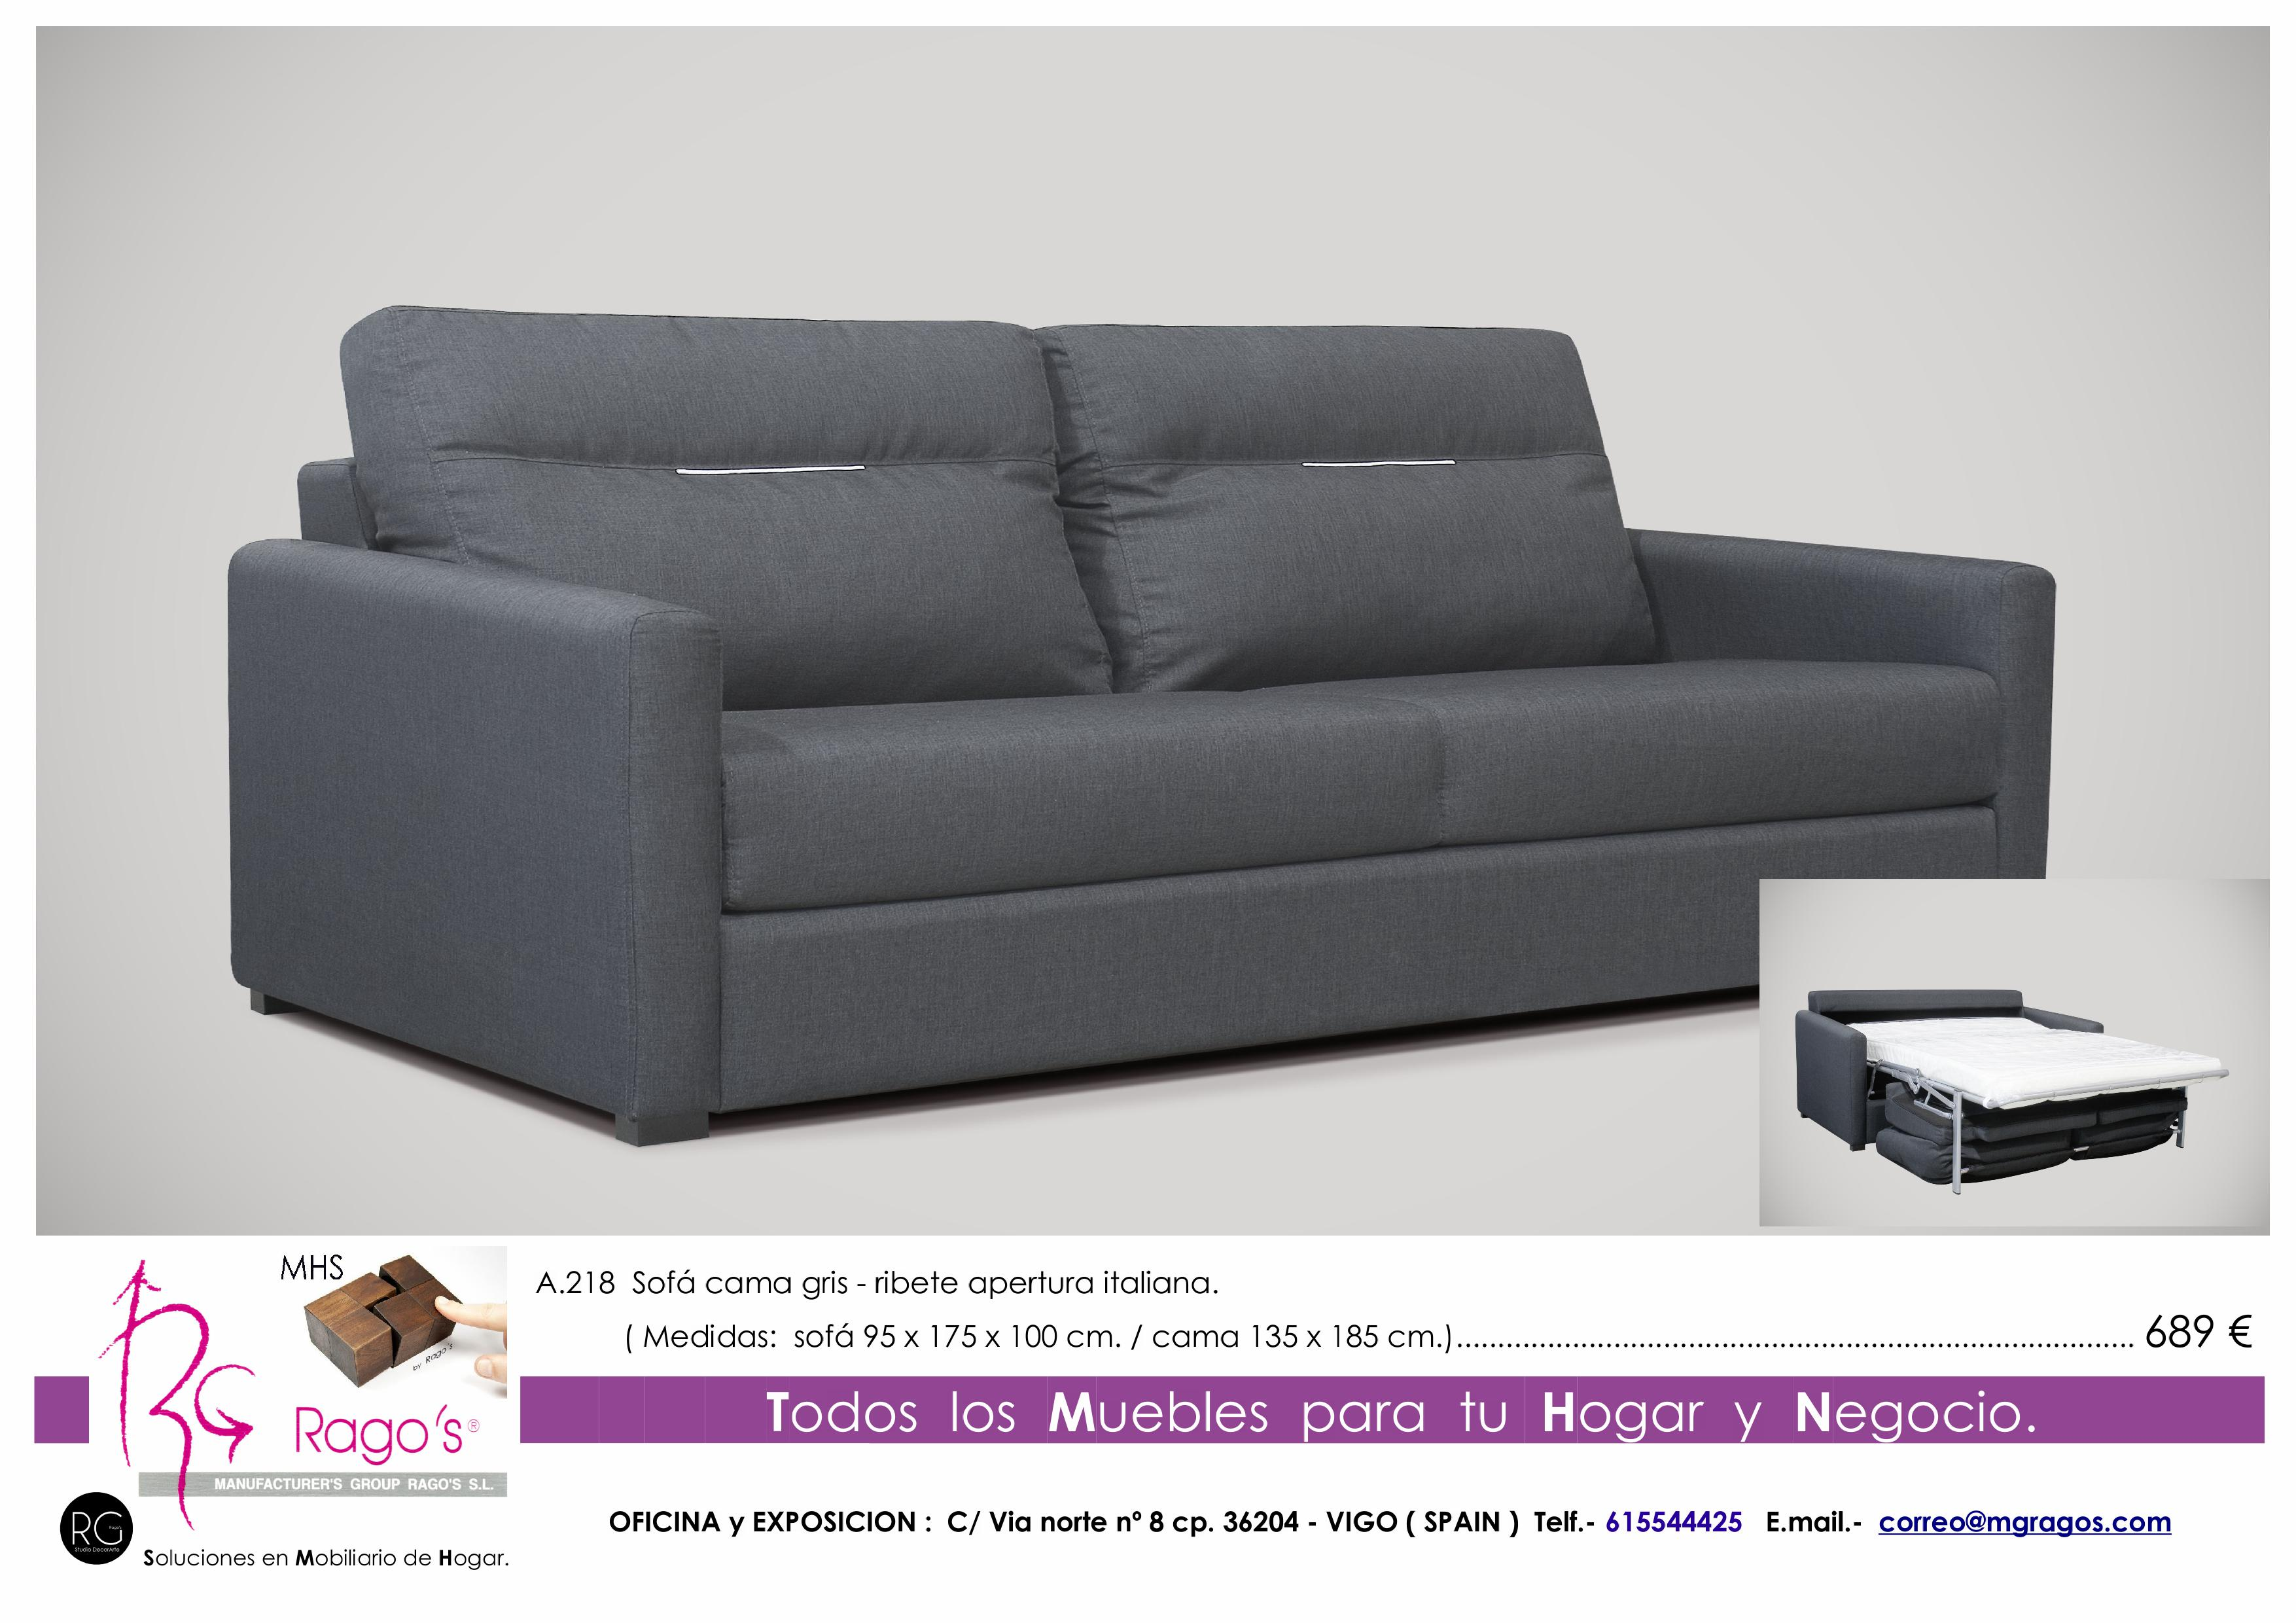 A.218 Sofa Cama Pag. nº 19